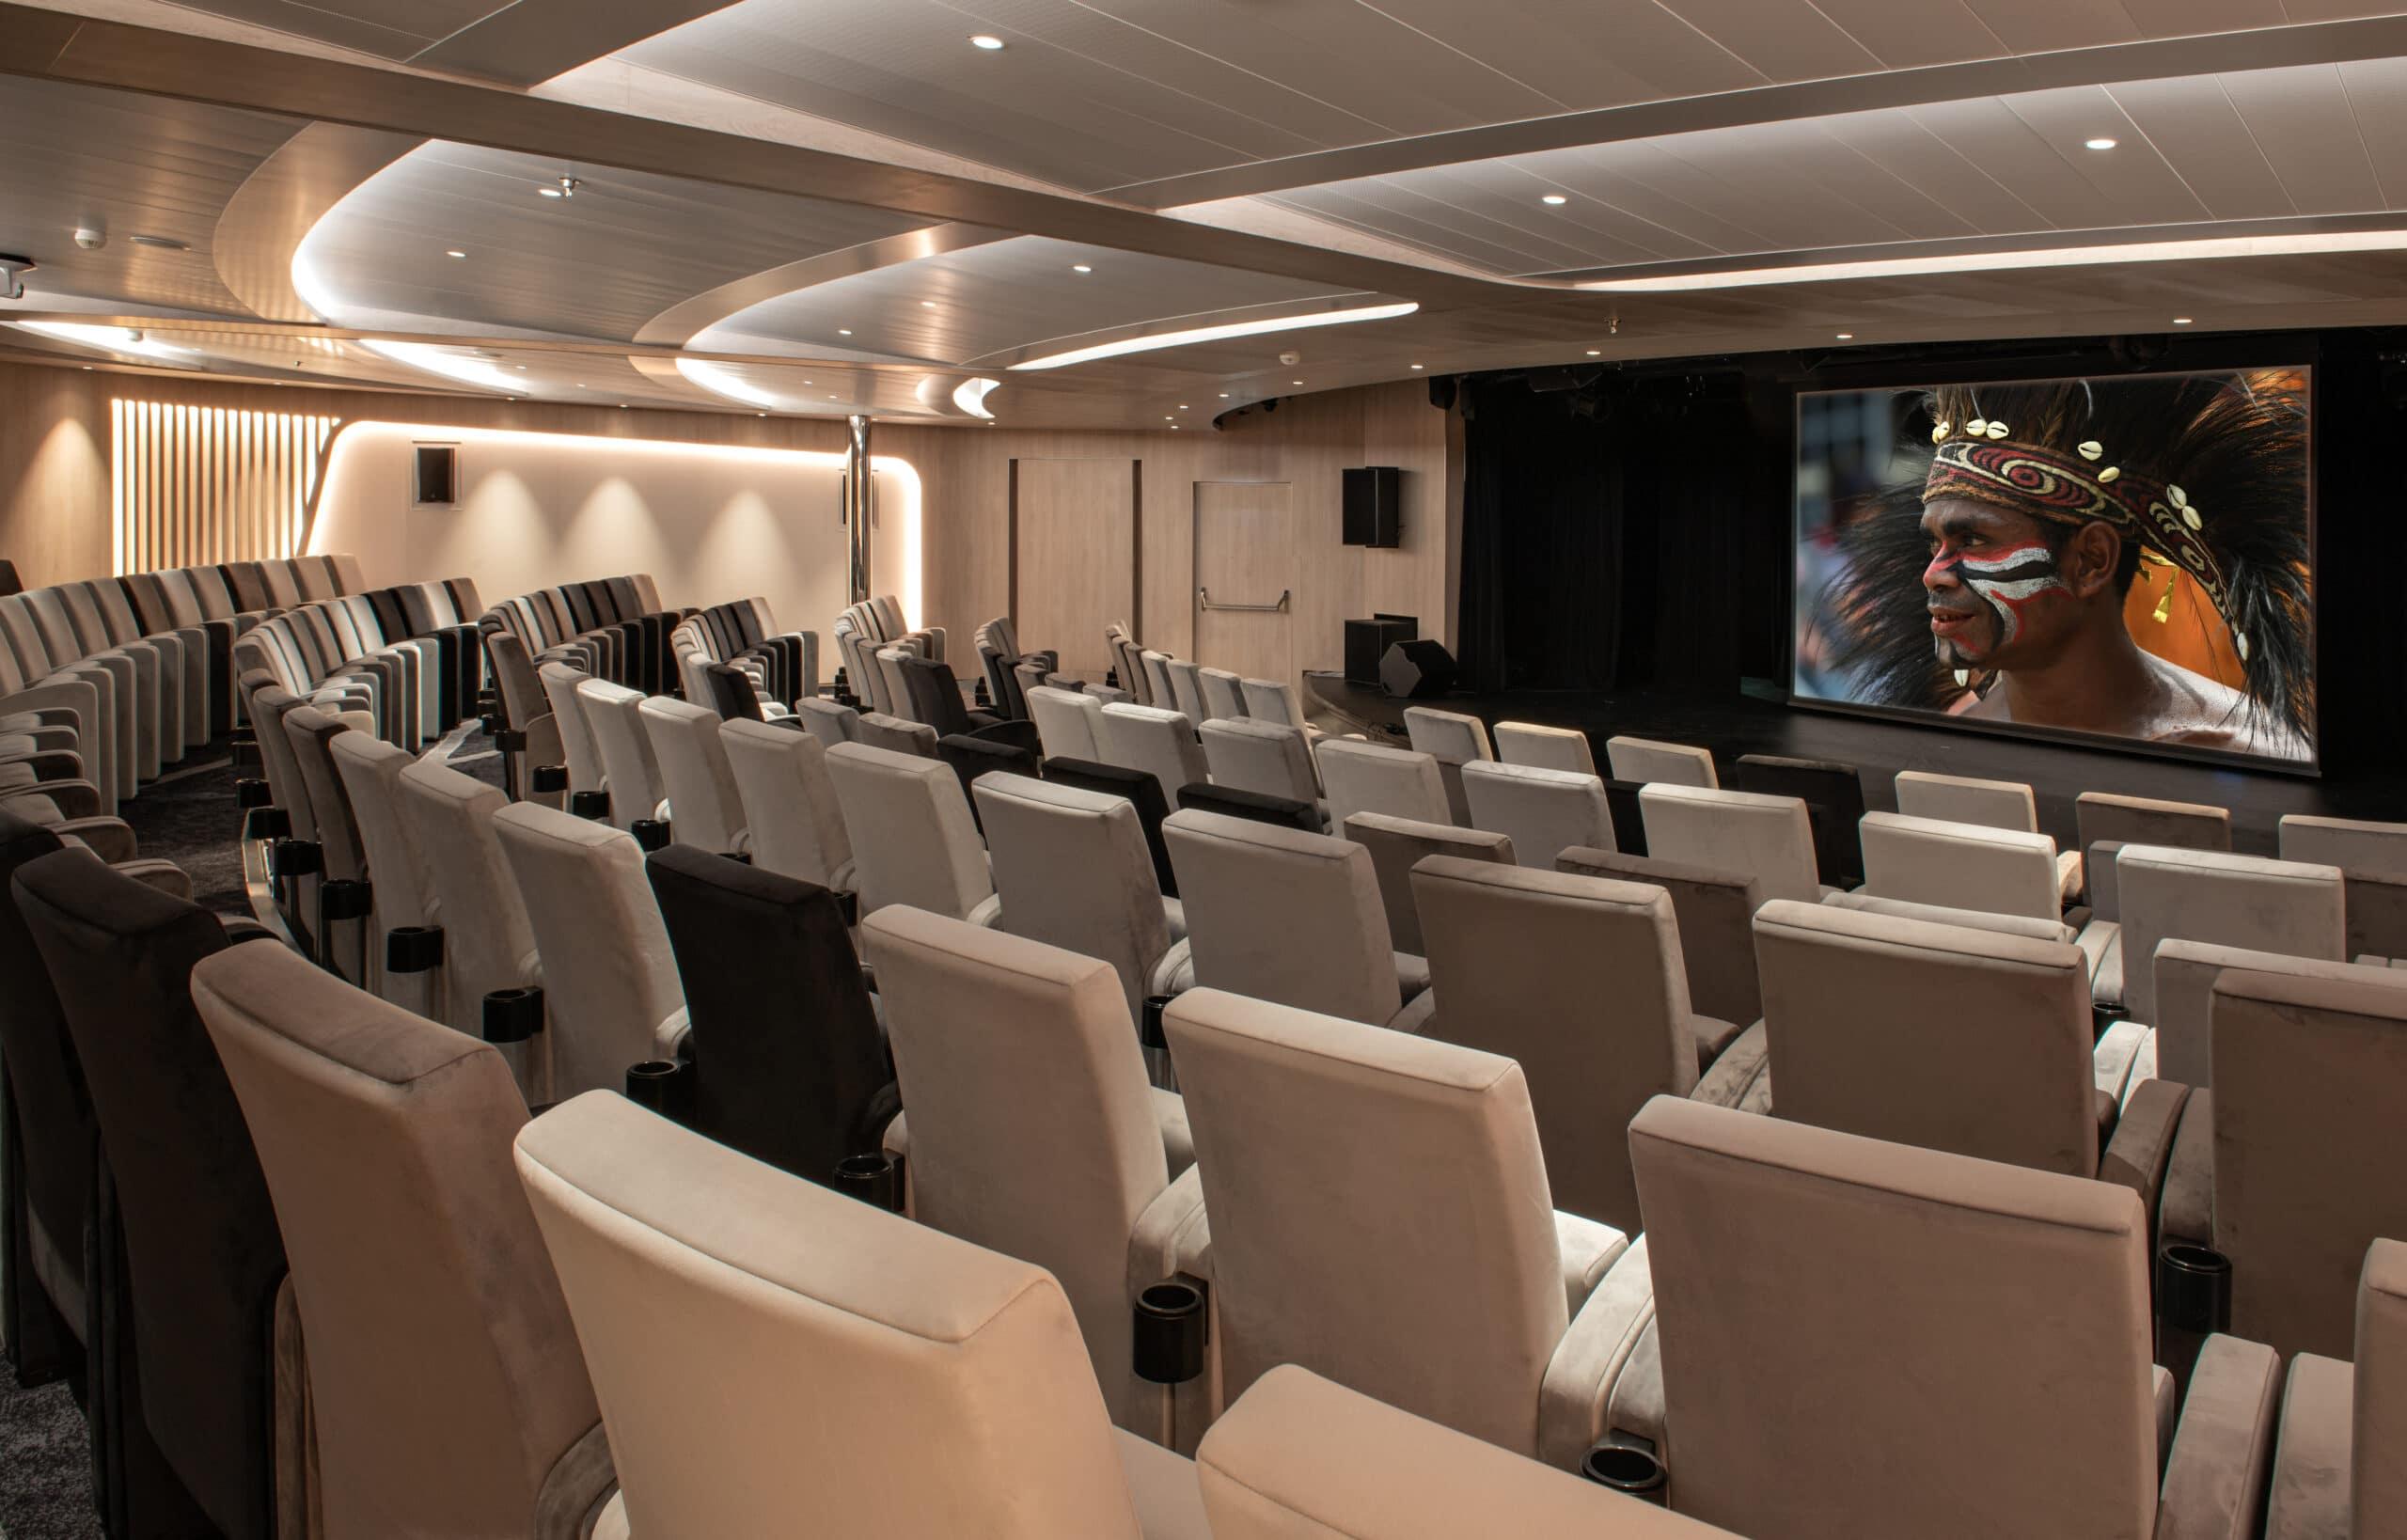 Cruiseschip-Le Bougainville-Ponant Yacht Cruises-Theater